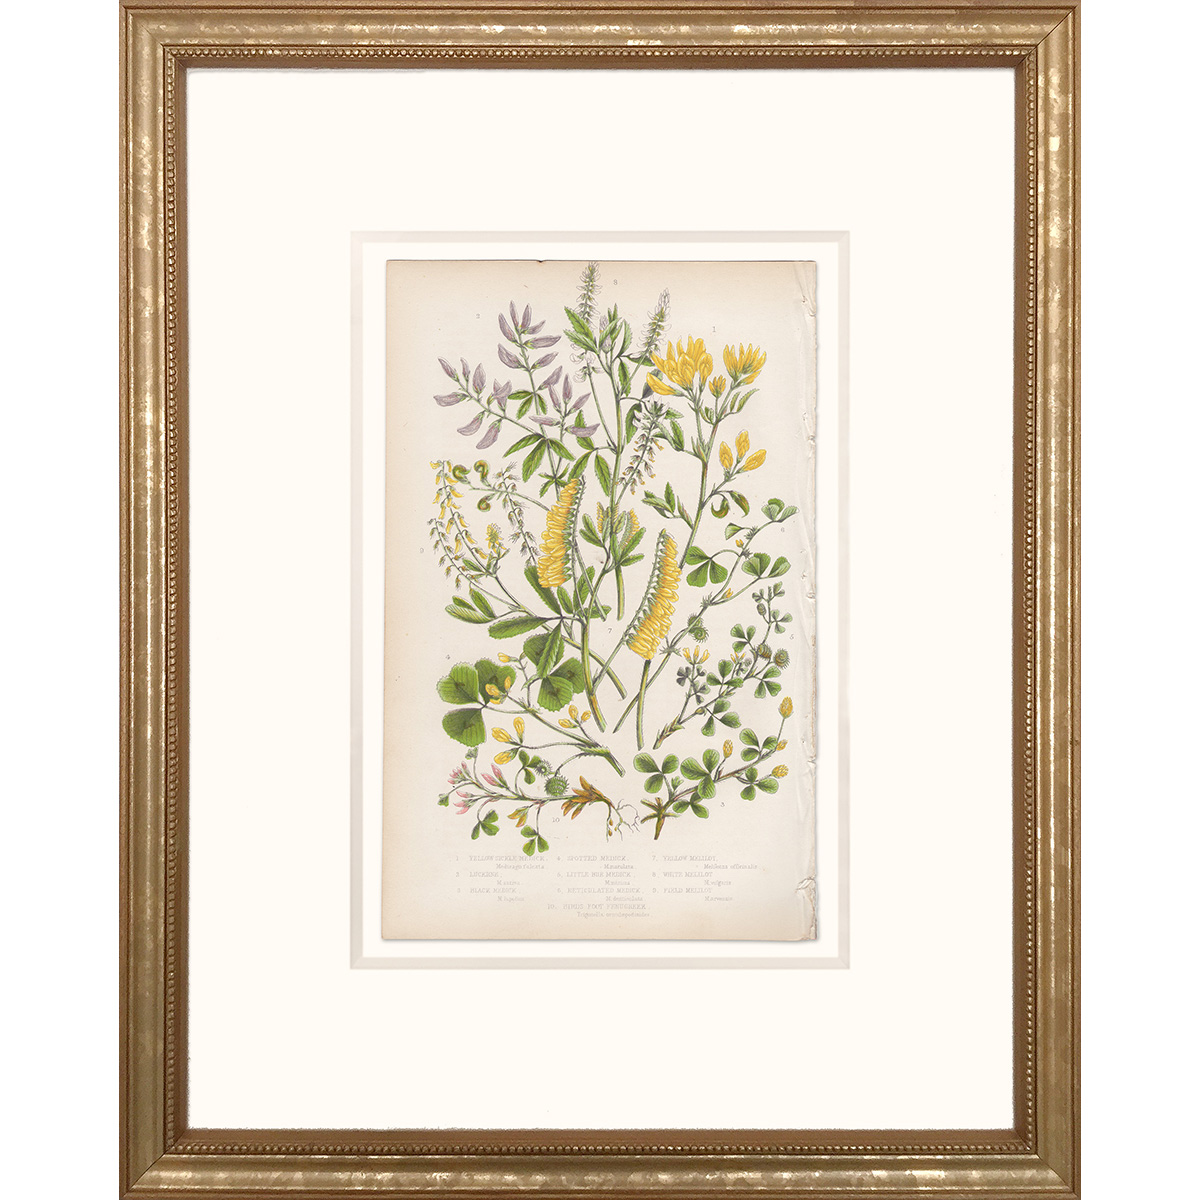 Anne Pratt Plate 58 Medick, Lucerne, Melilot - Framed print